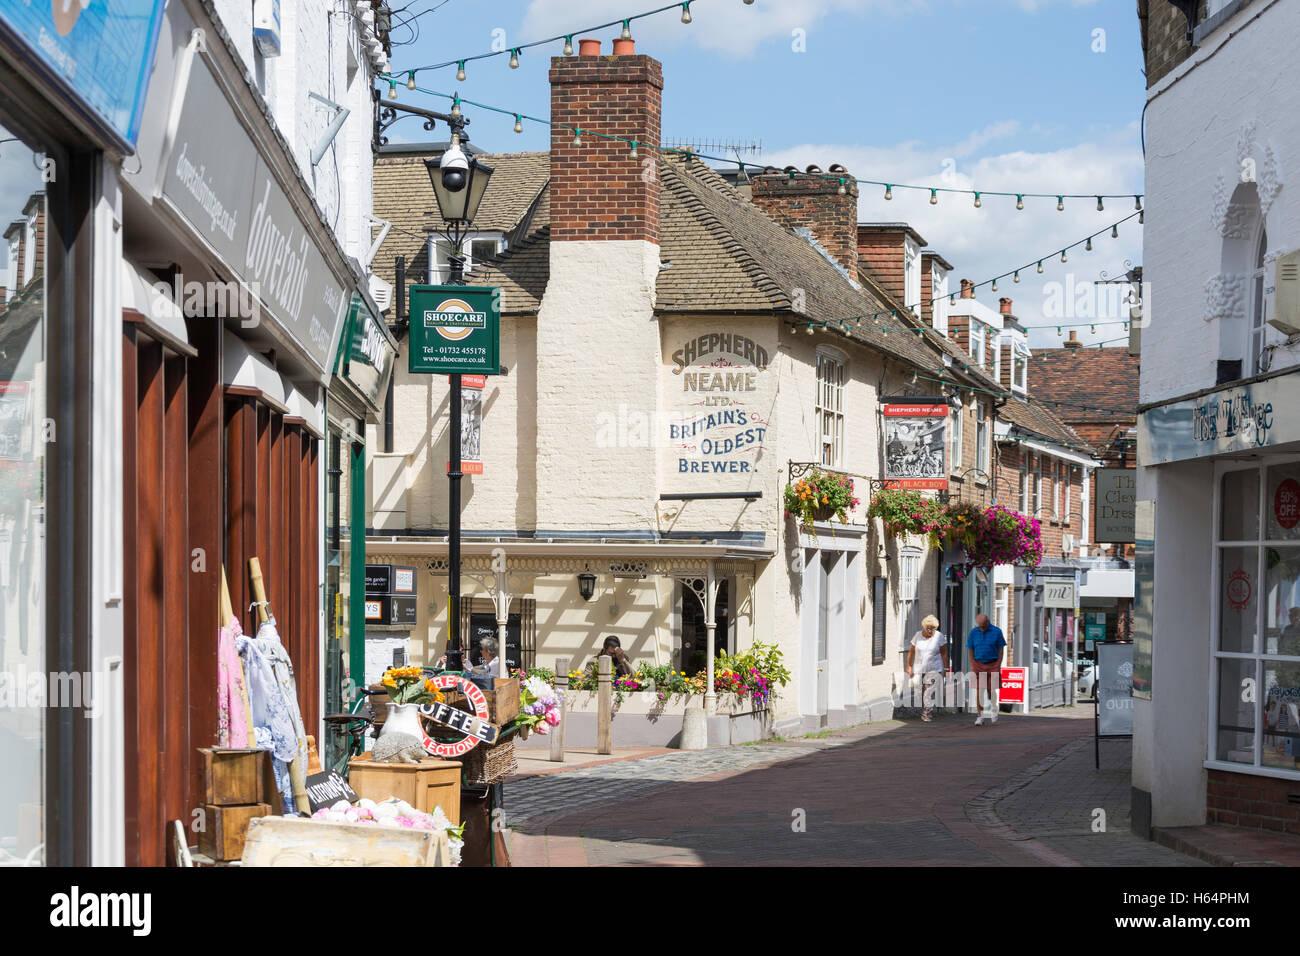 The Black Boy Pub, Bank Street, Sevenoaks, Kent, England, United Kingdom - Stock Image